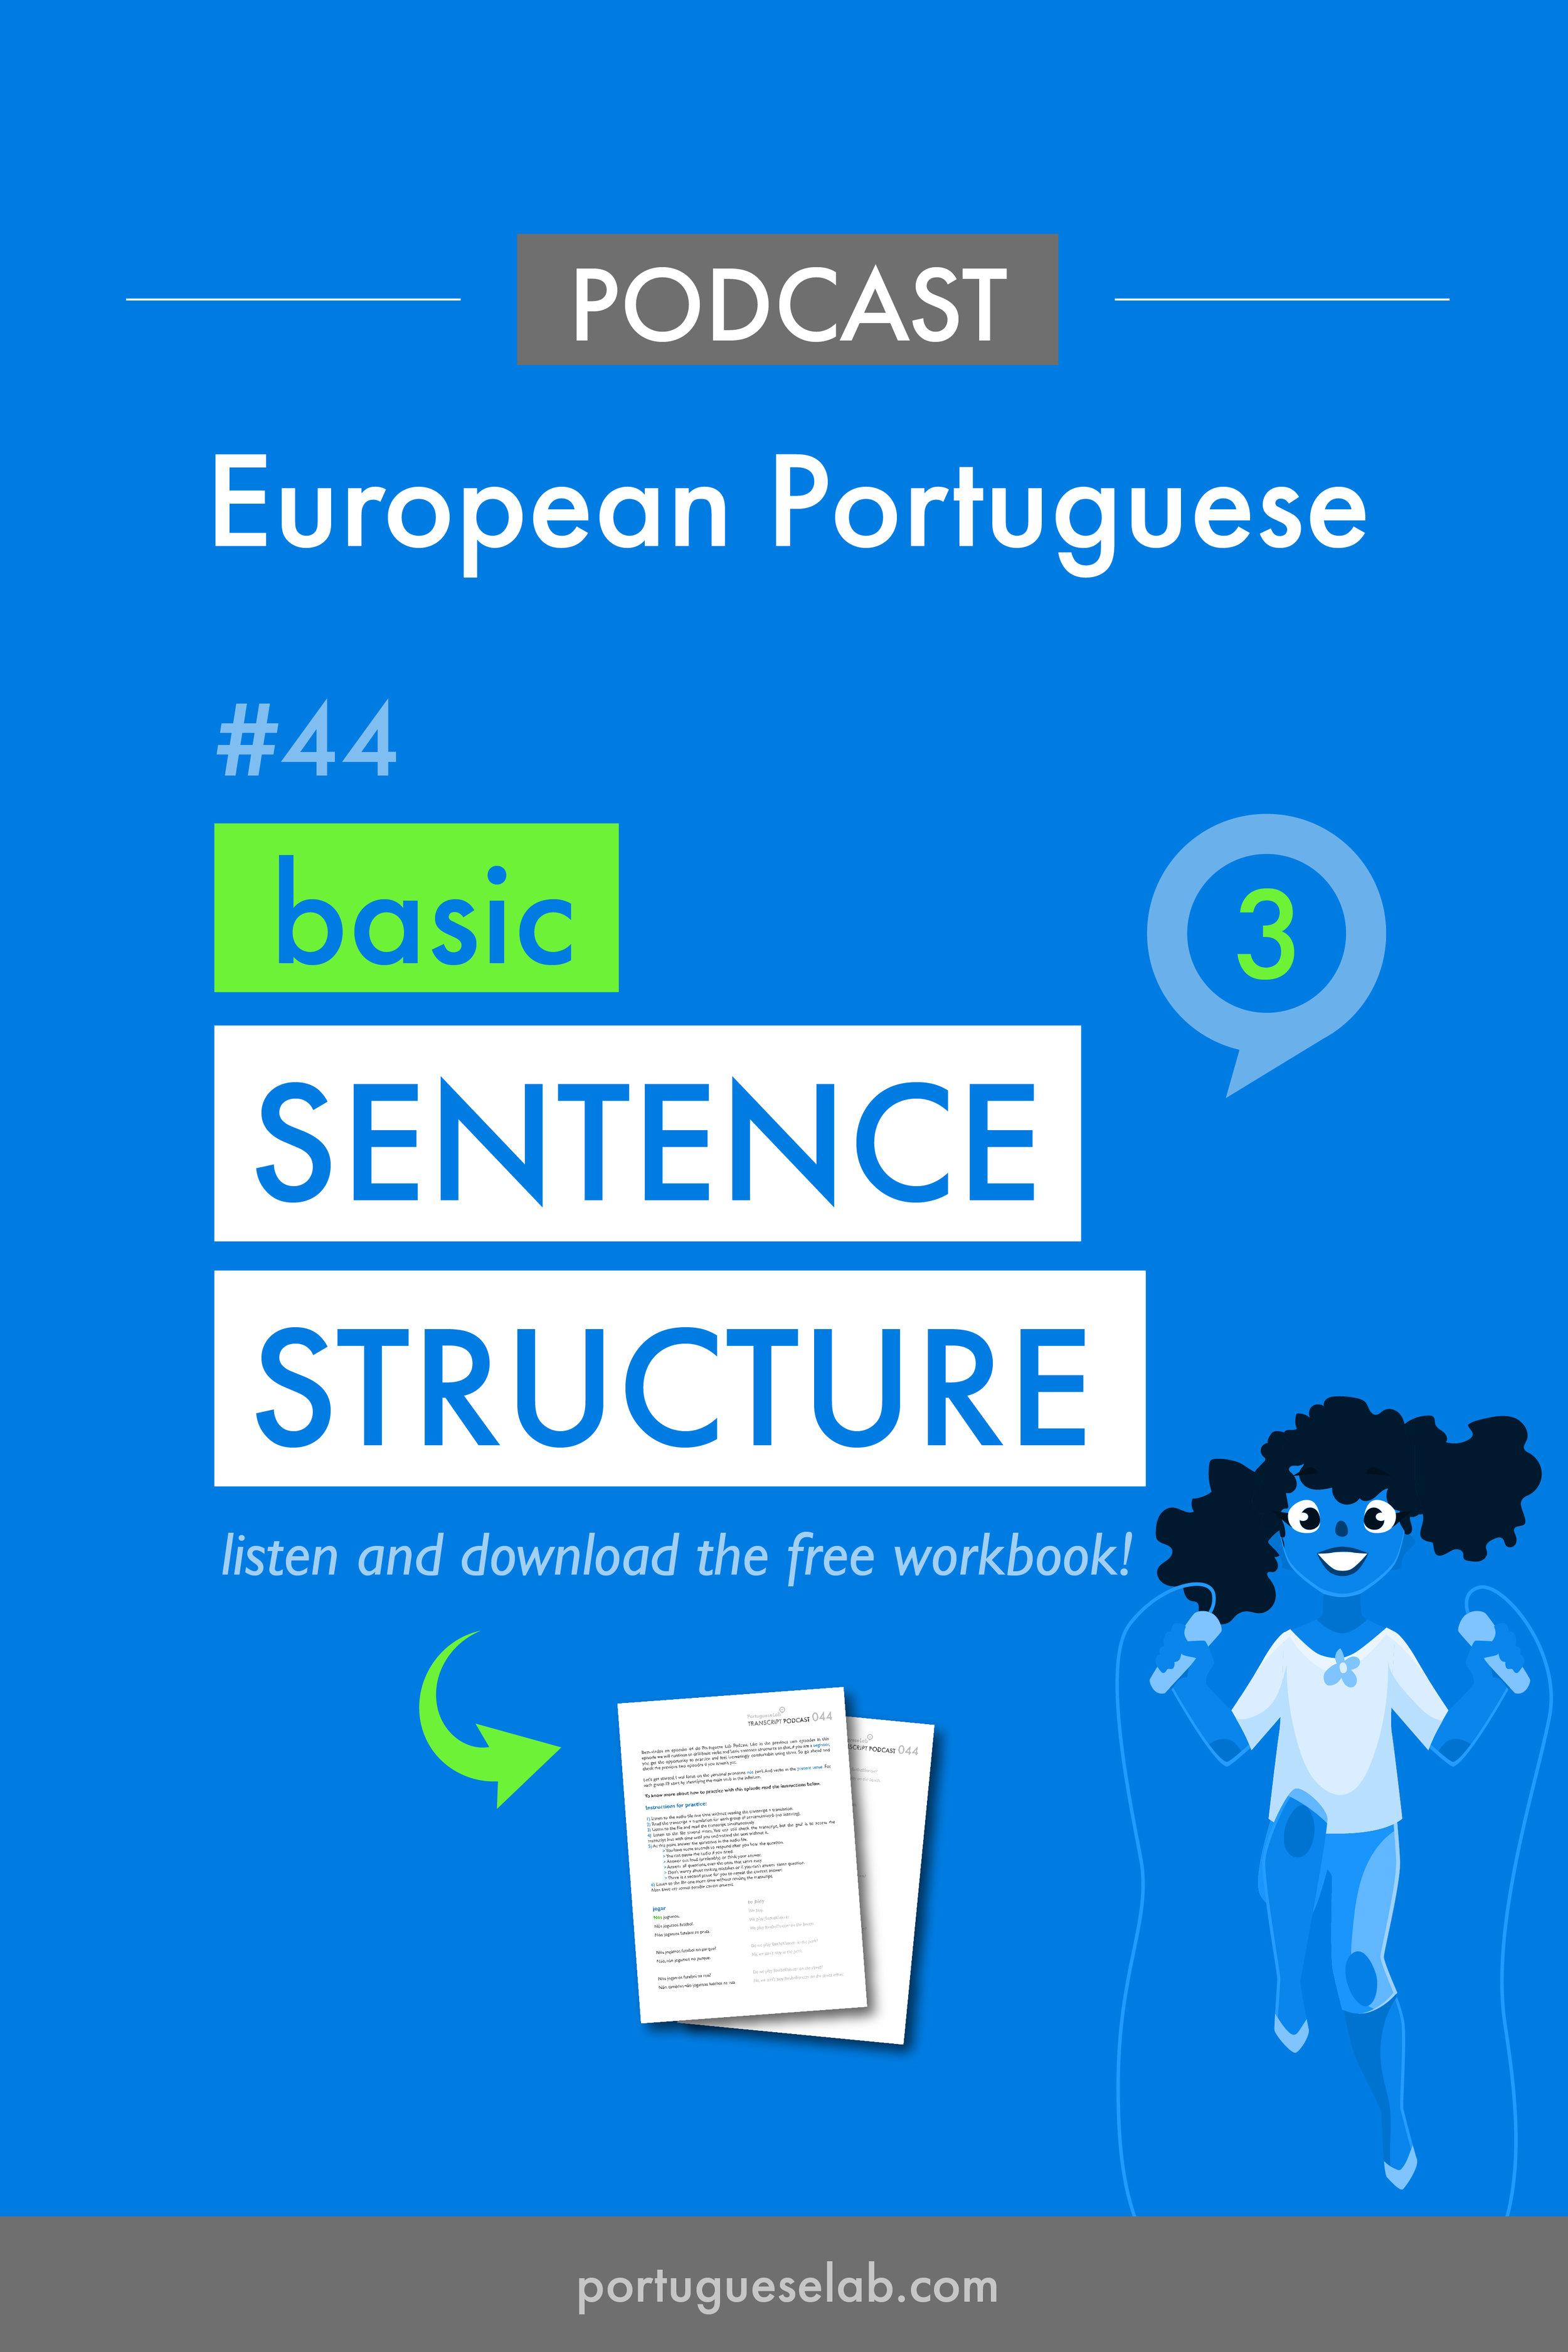 Portuguese Lab Podcast - European Portuguese - 44 - Beginners - basic sentence structure 3.jpg